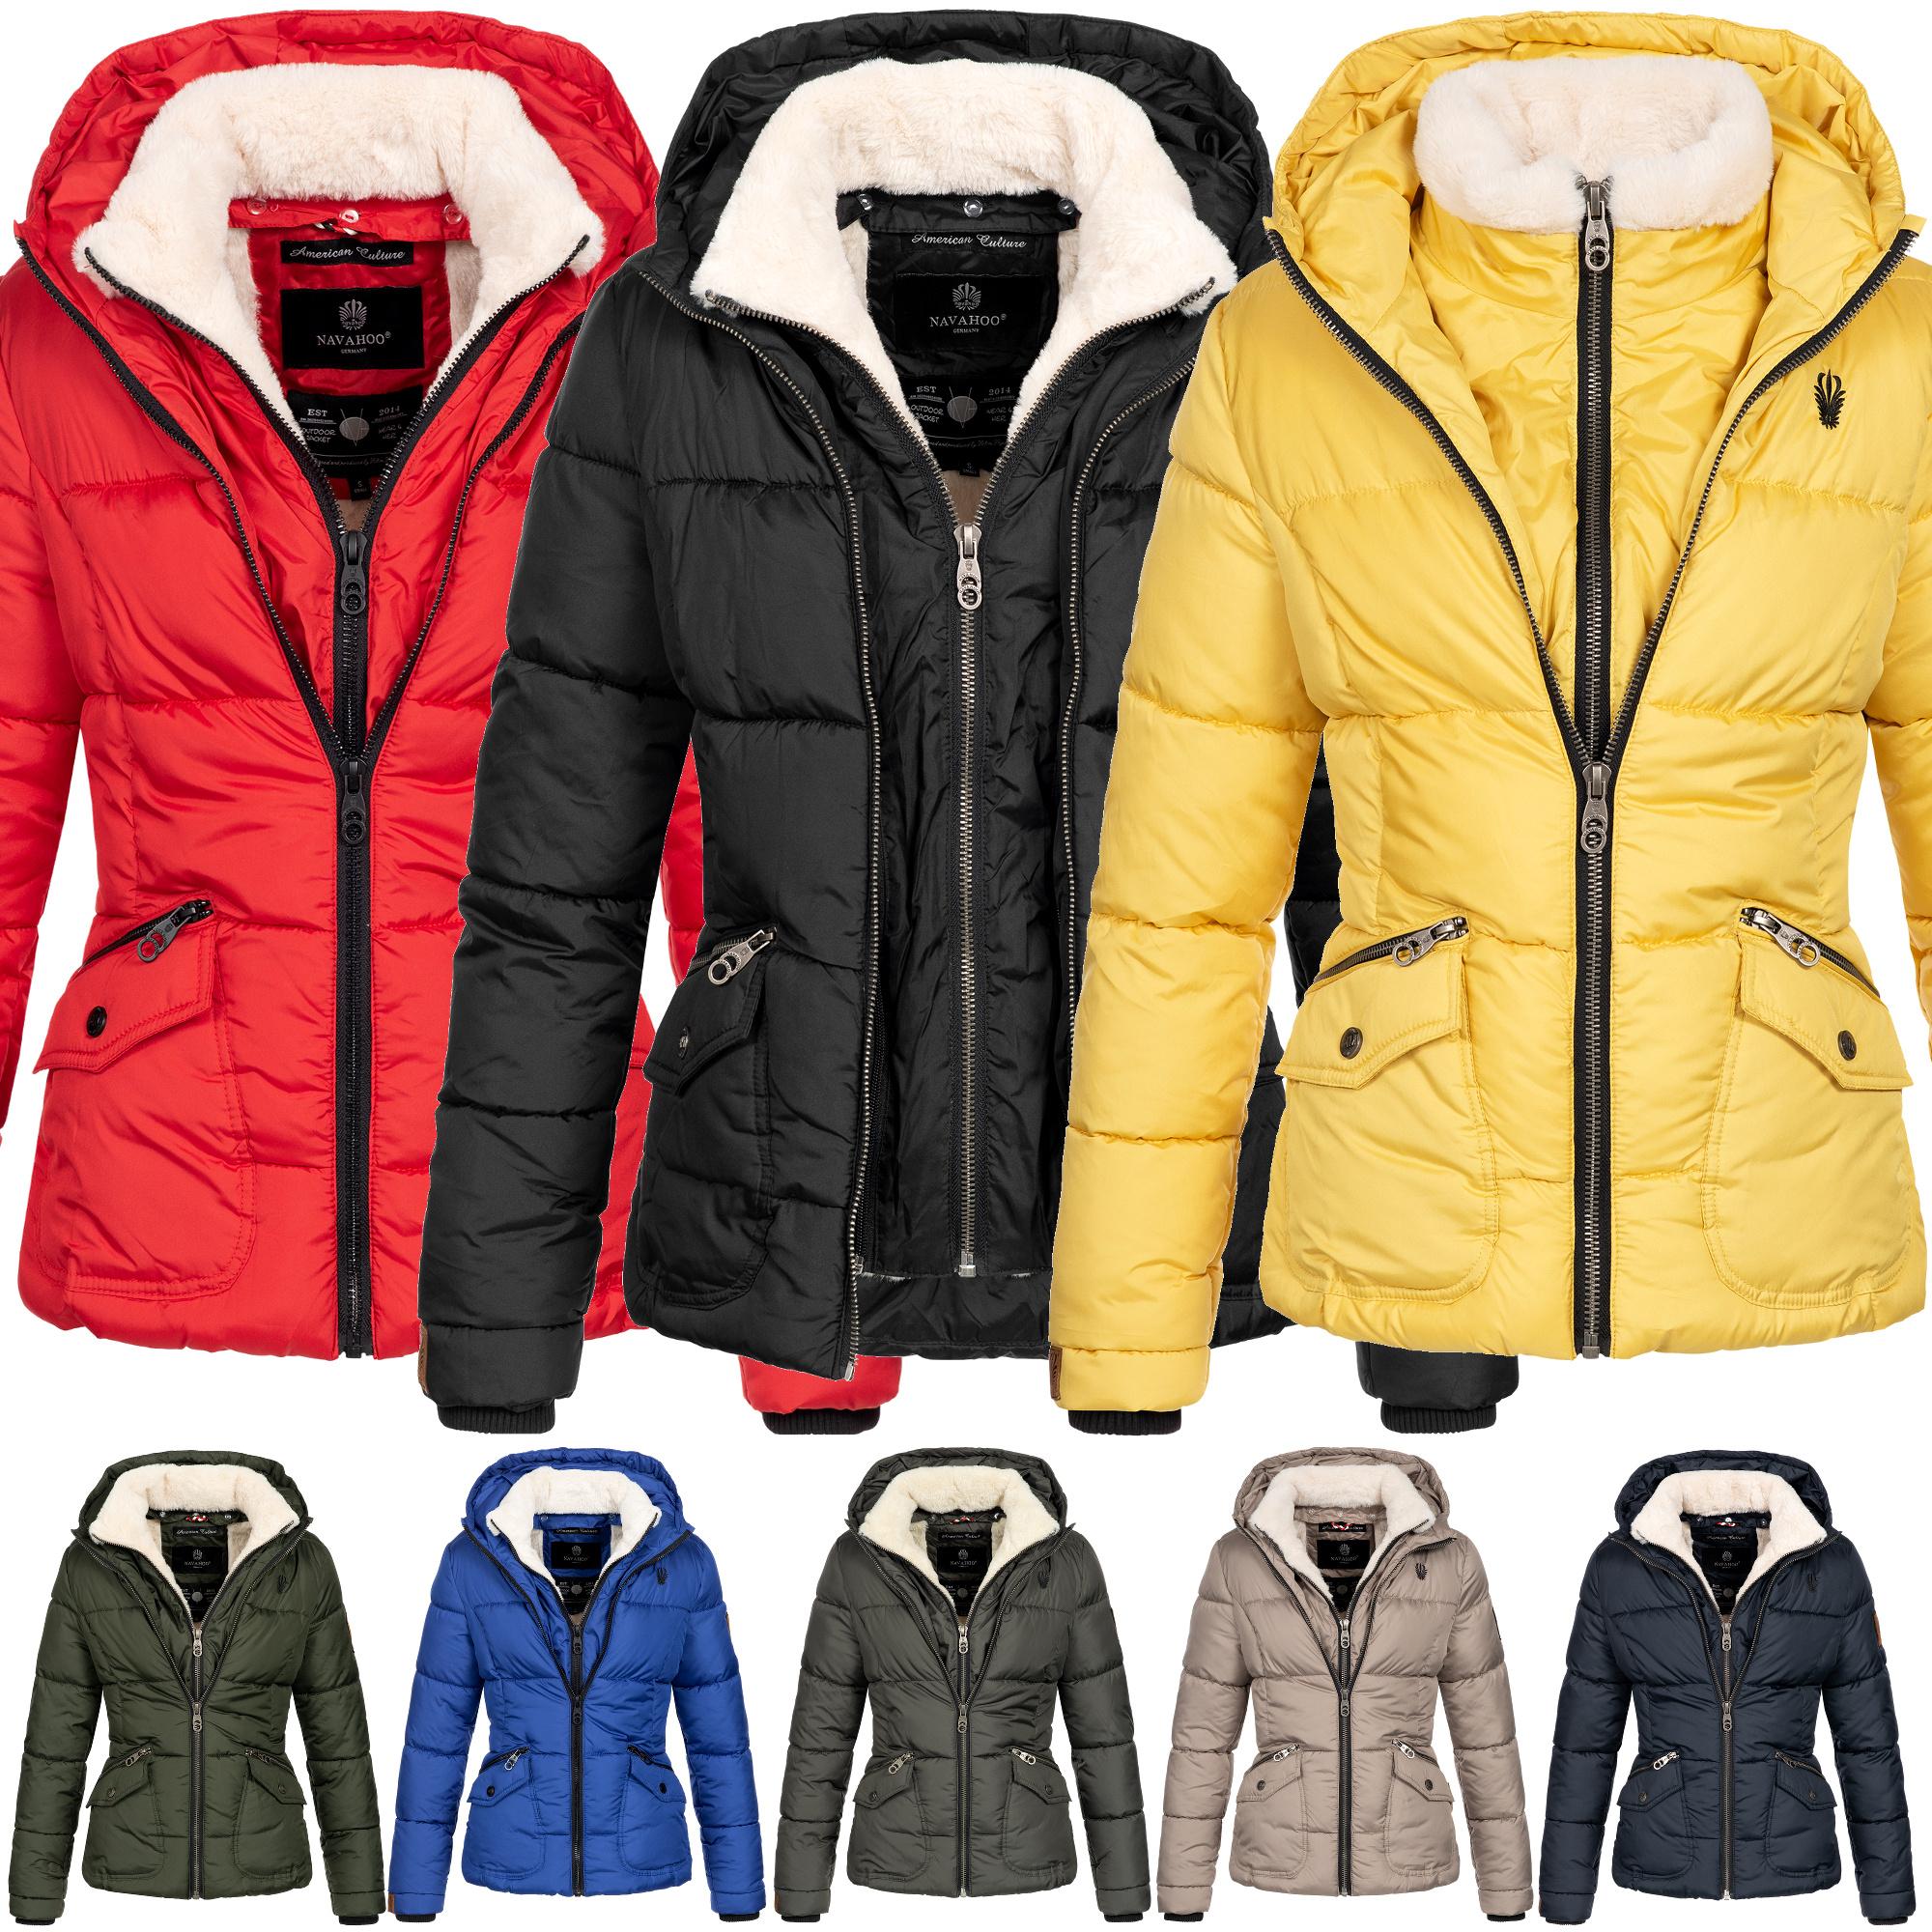 88125efe0d350d Navahoo Jacke Winterjacke Damen Steppjacke Parka warm Teddyfell Megan  XS-XXL 8-Farben